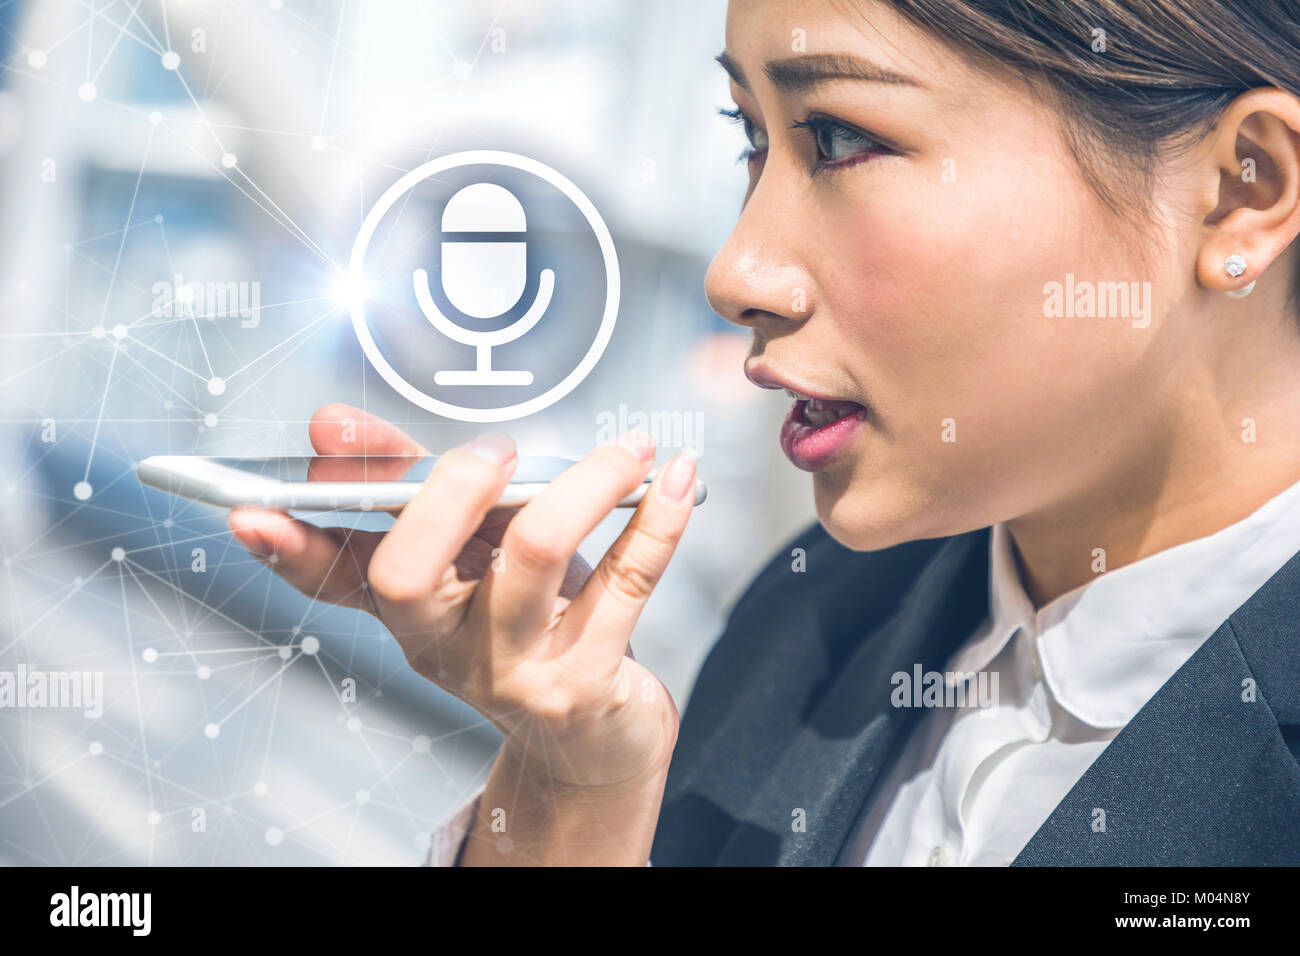 Voice recognition concept. - Stock Image